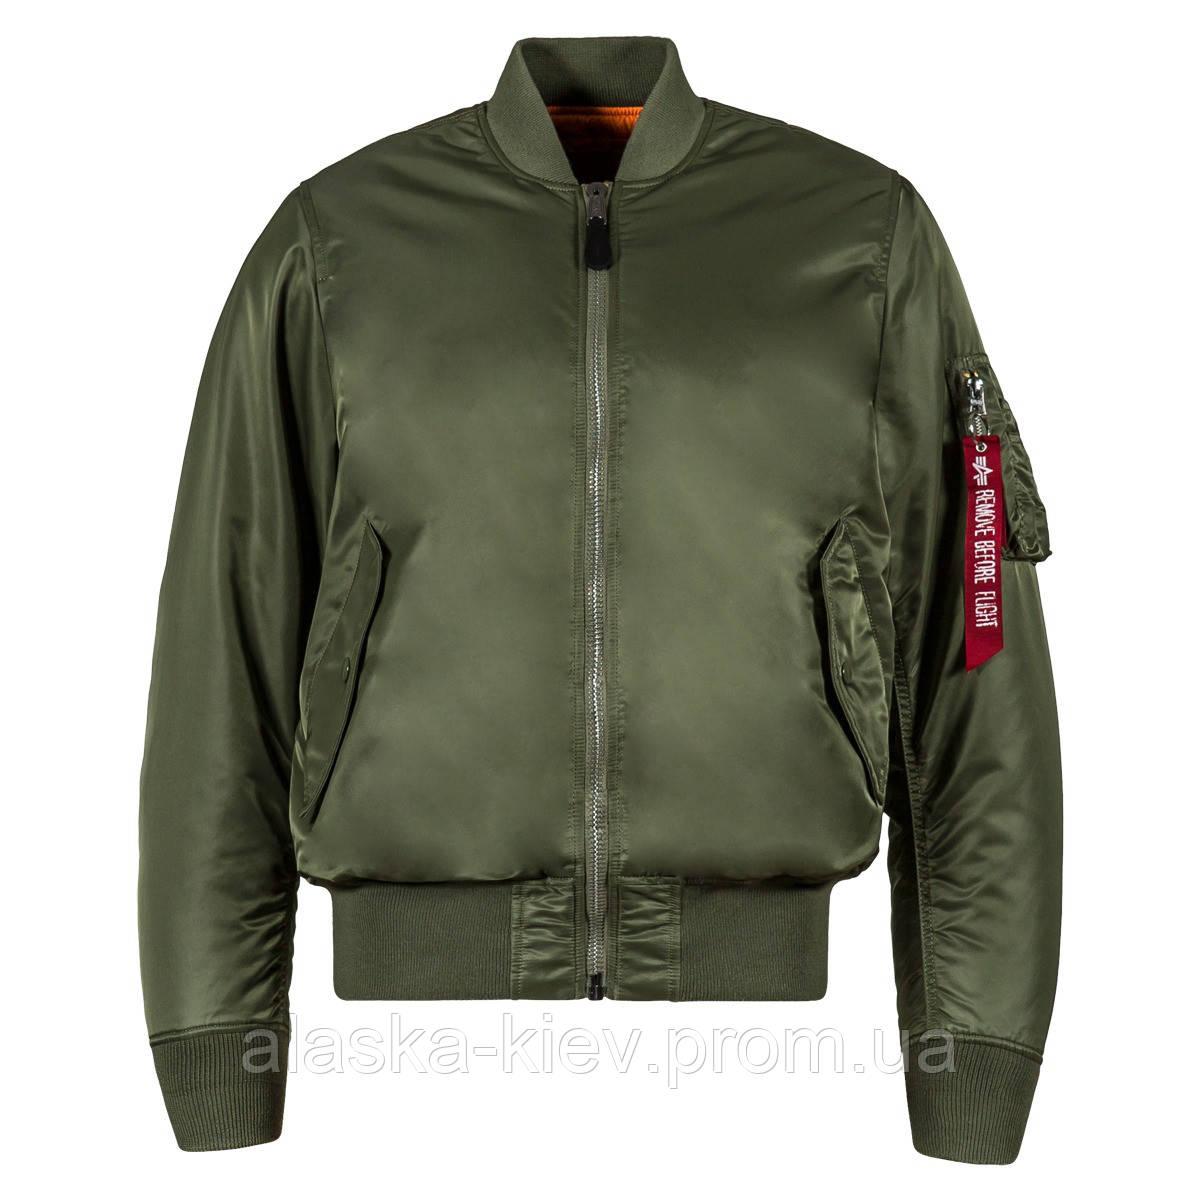 Классический бомбер. Демисезонная куртка бомбер MA-1 (sage green ... 98b76884255a4